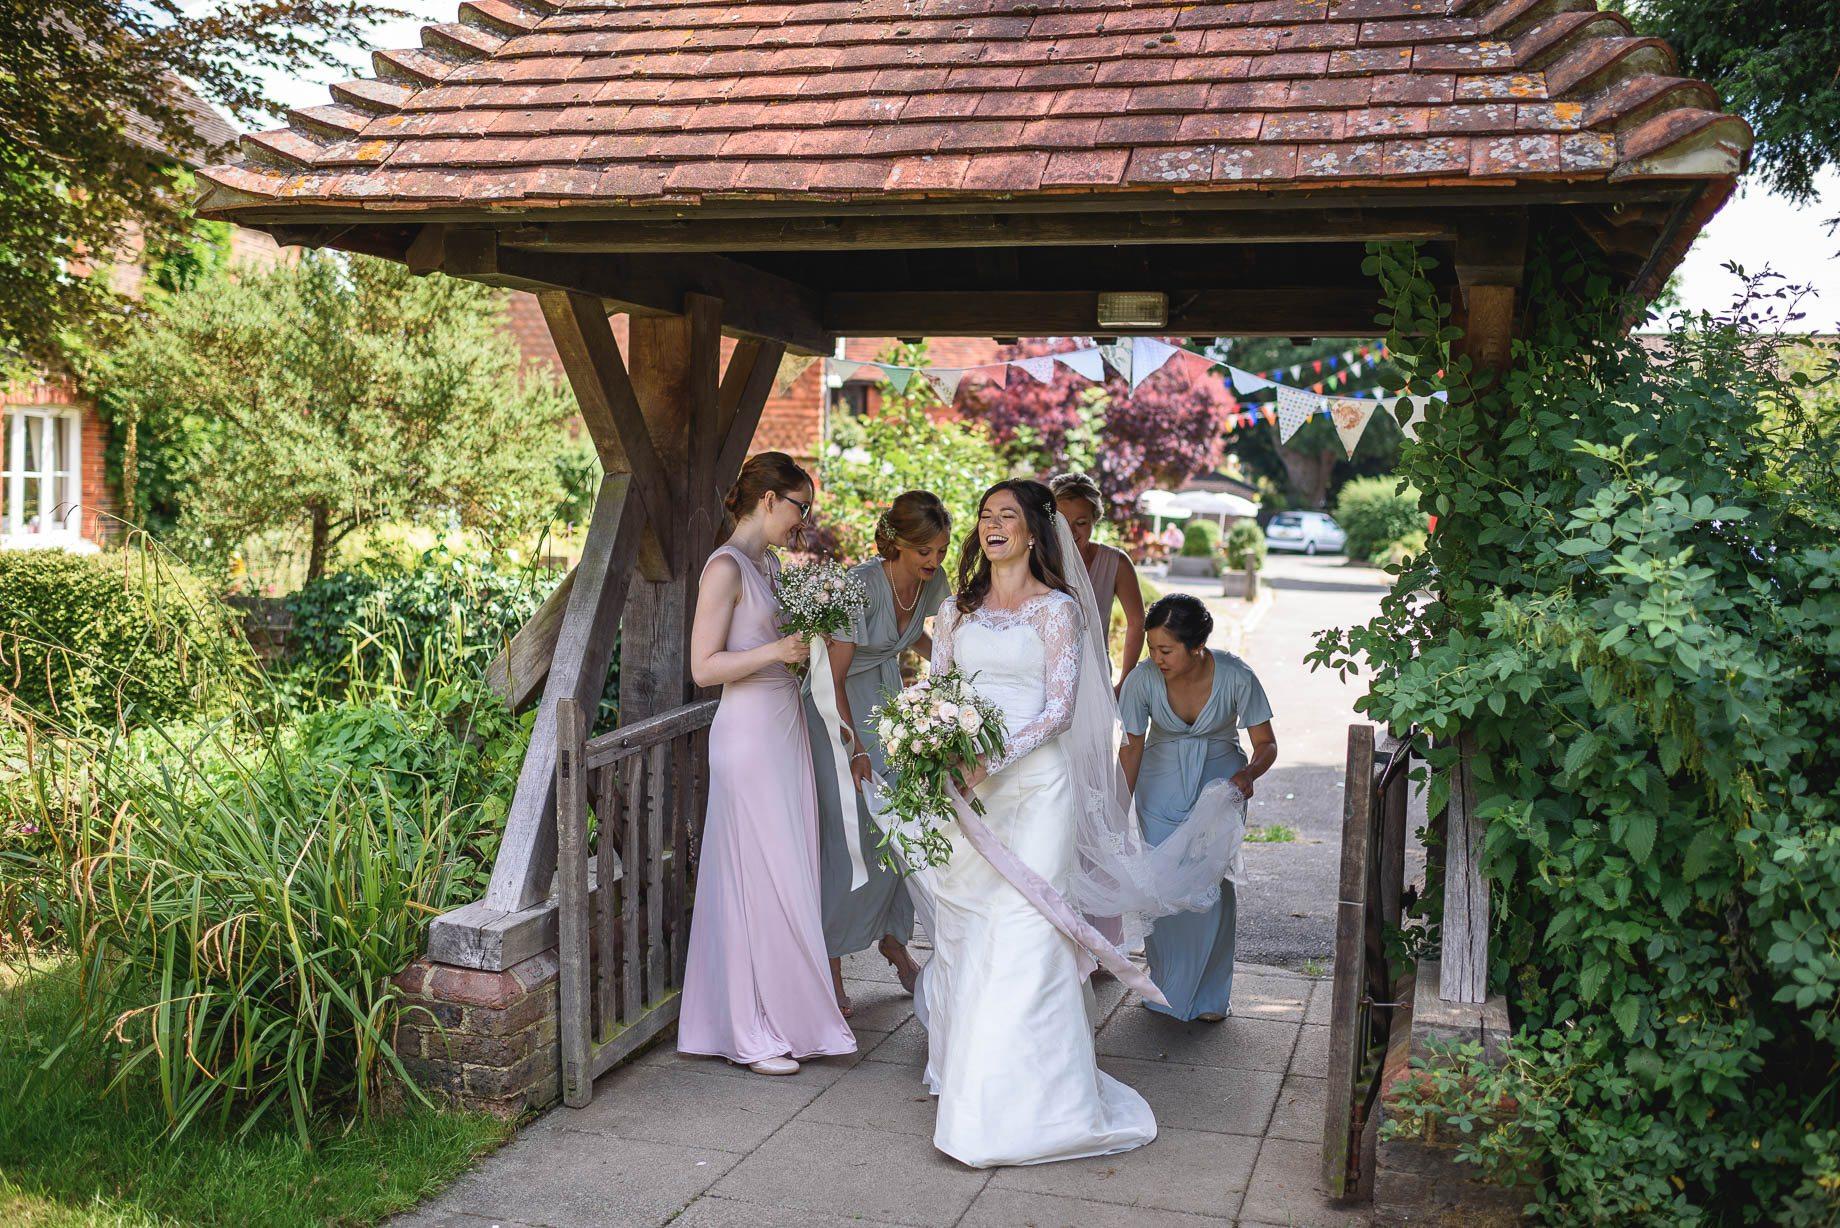 Gildings Barn wedding photography - Sarah and Steve (40 of 190)